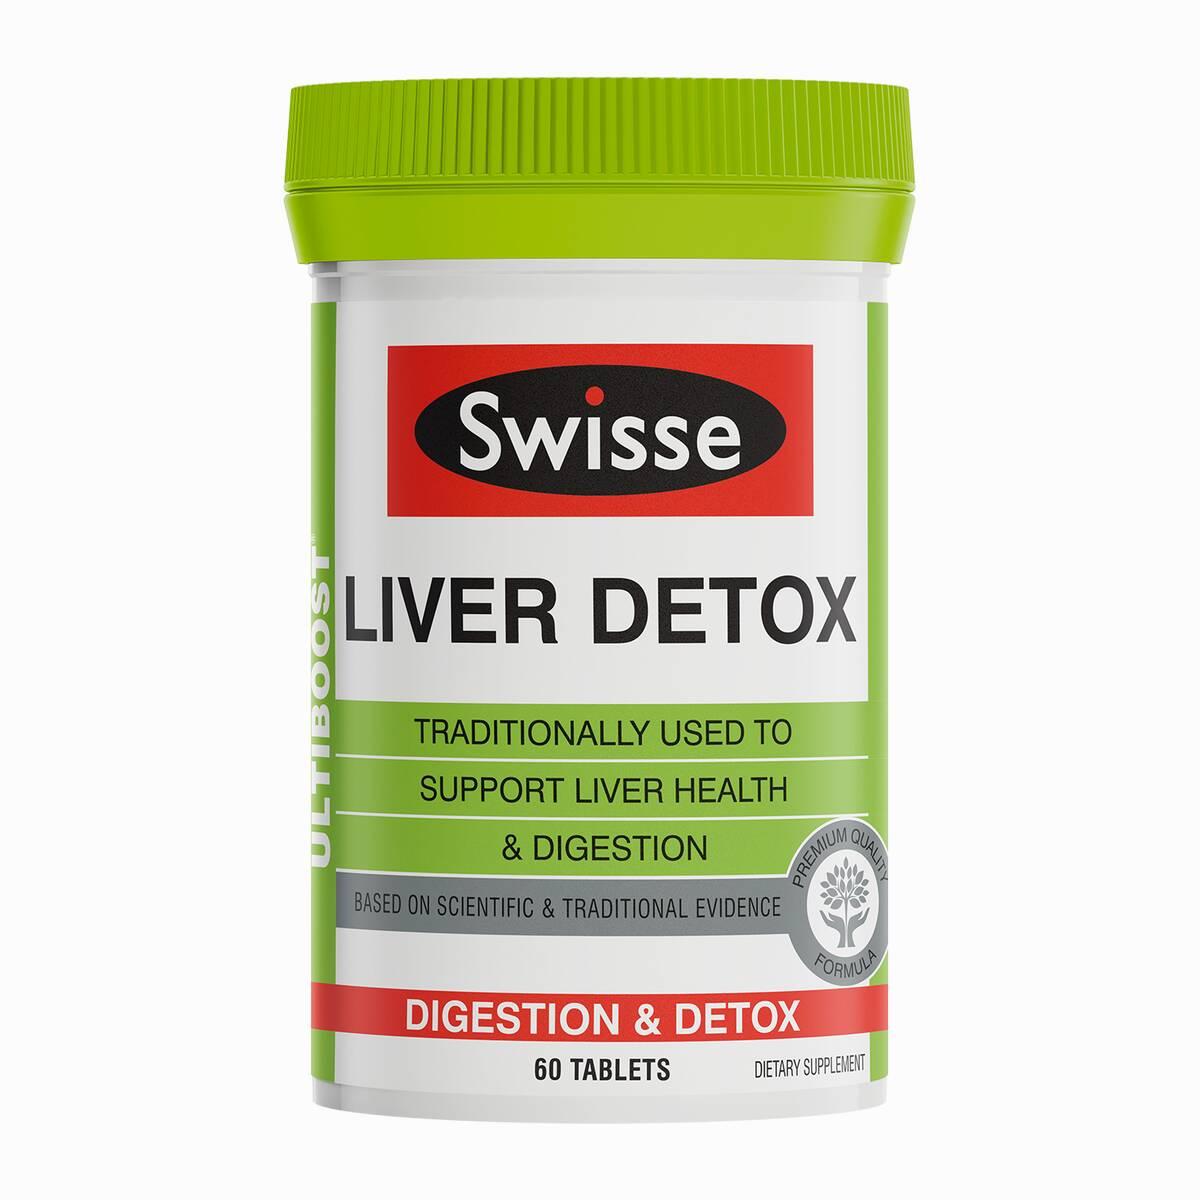 Swisse Ultiboost Liver Detox product 60 tabs product image